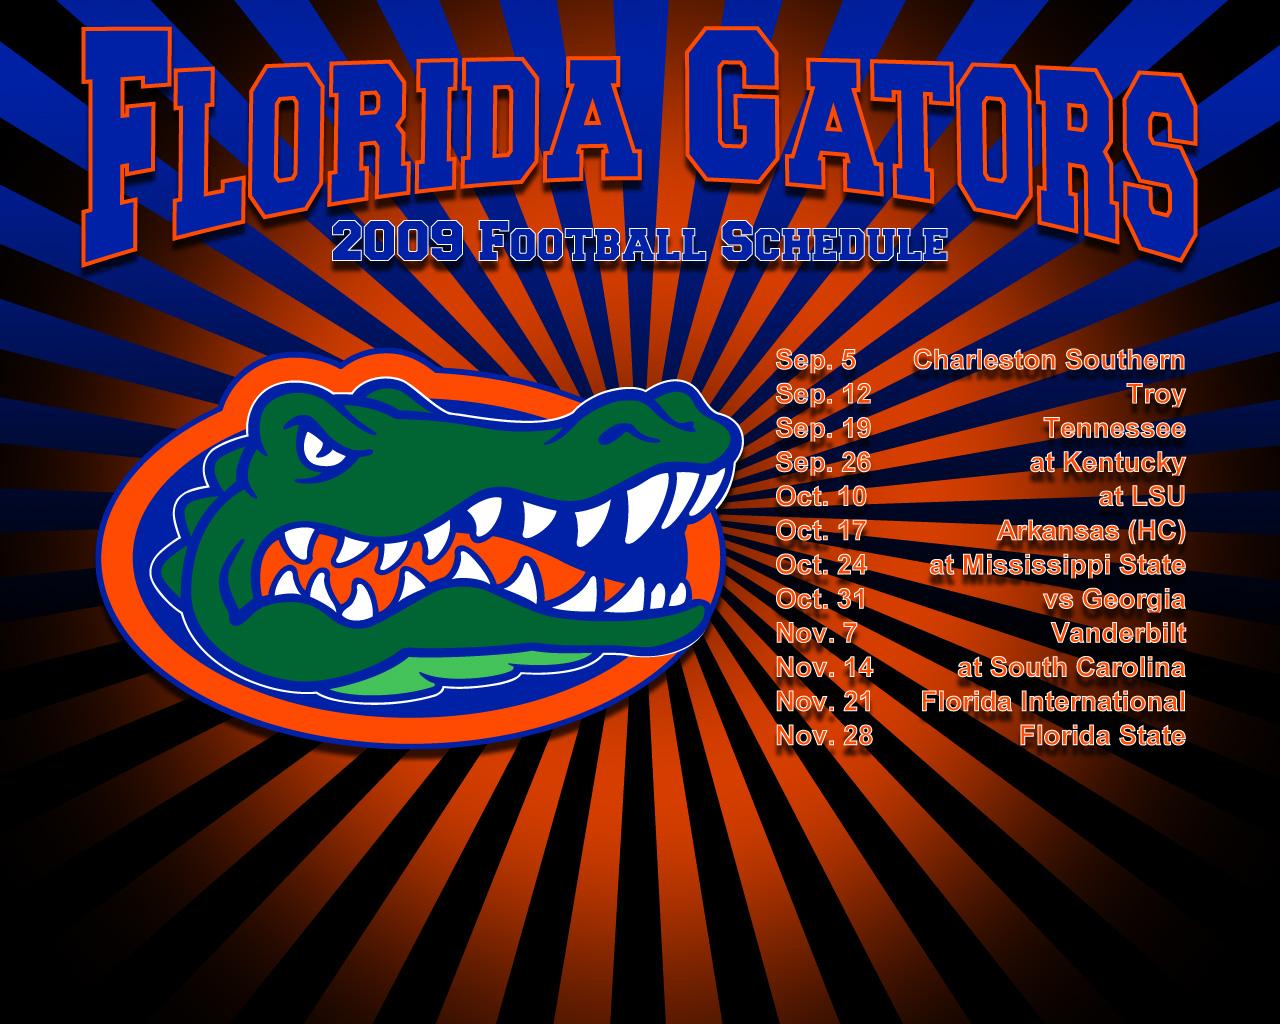 2009 gator football schedule florida gators wallpaper - Florida gators background ...